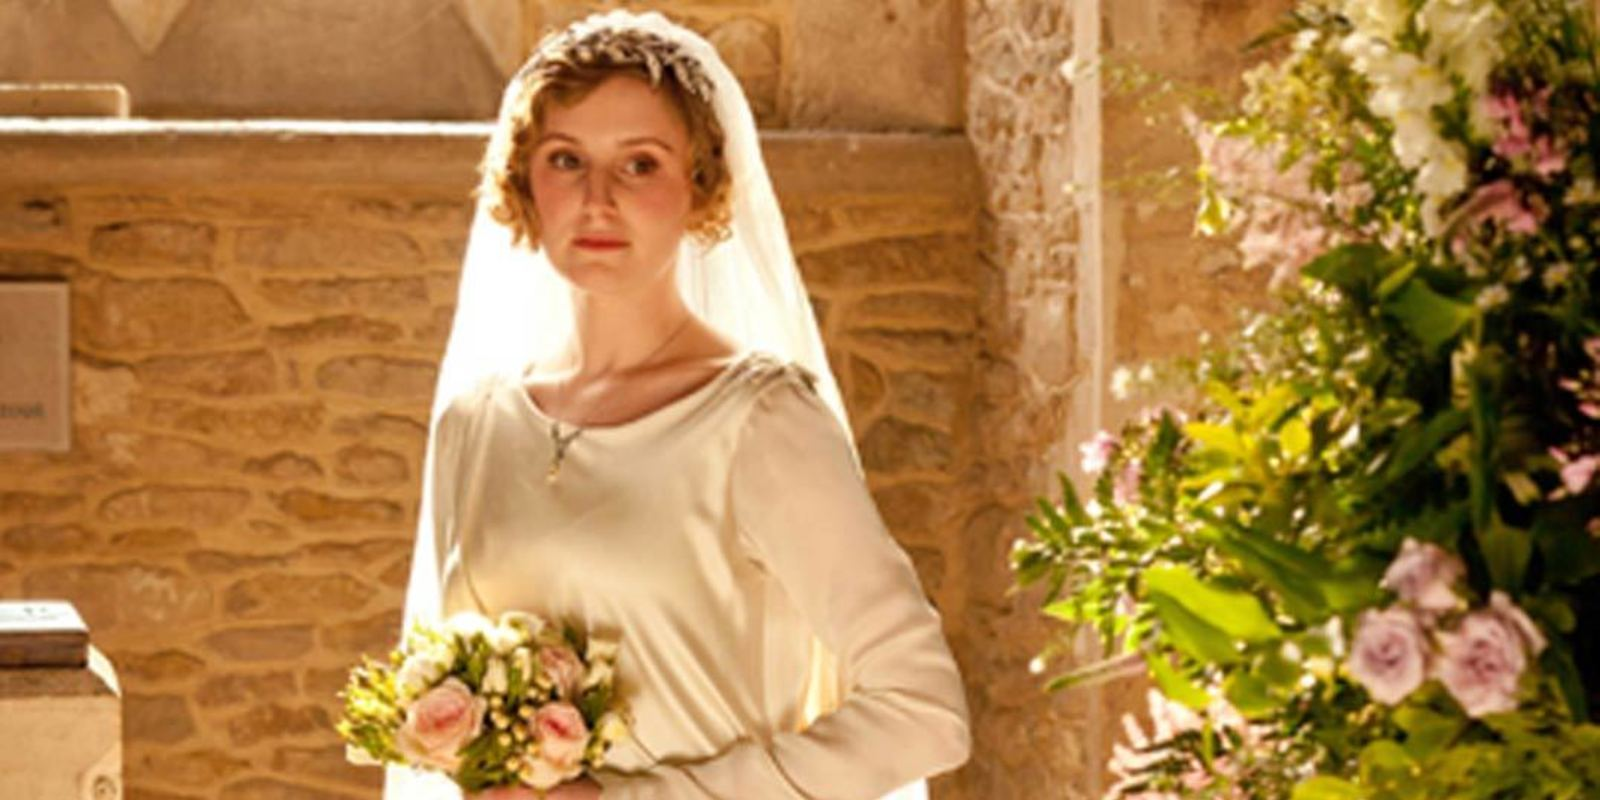 Downton abbey wedding dress inspiration elle uk for Downton abbey style wedding dress